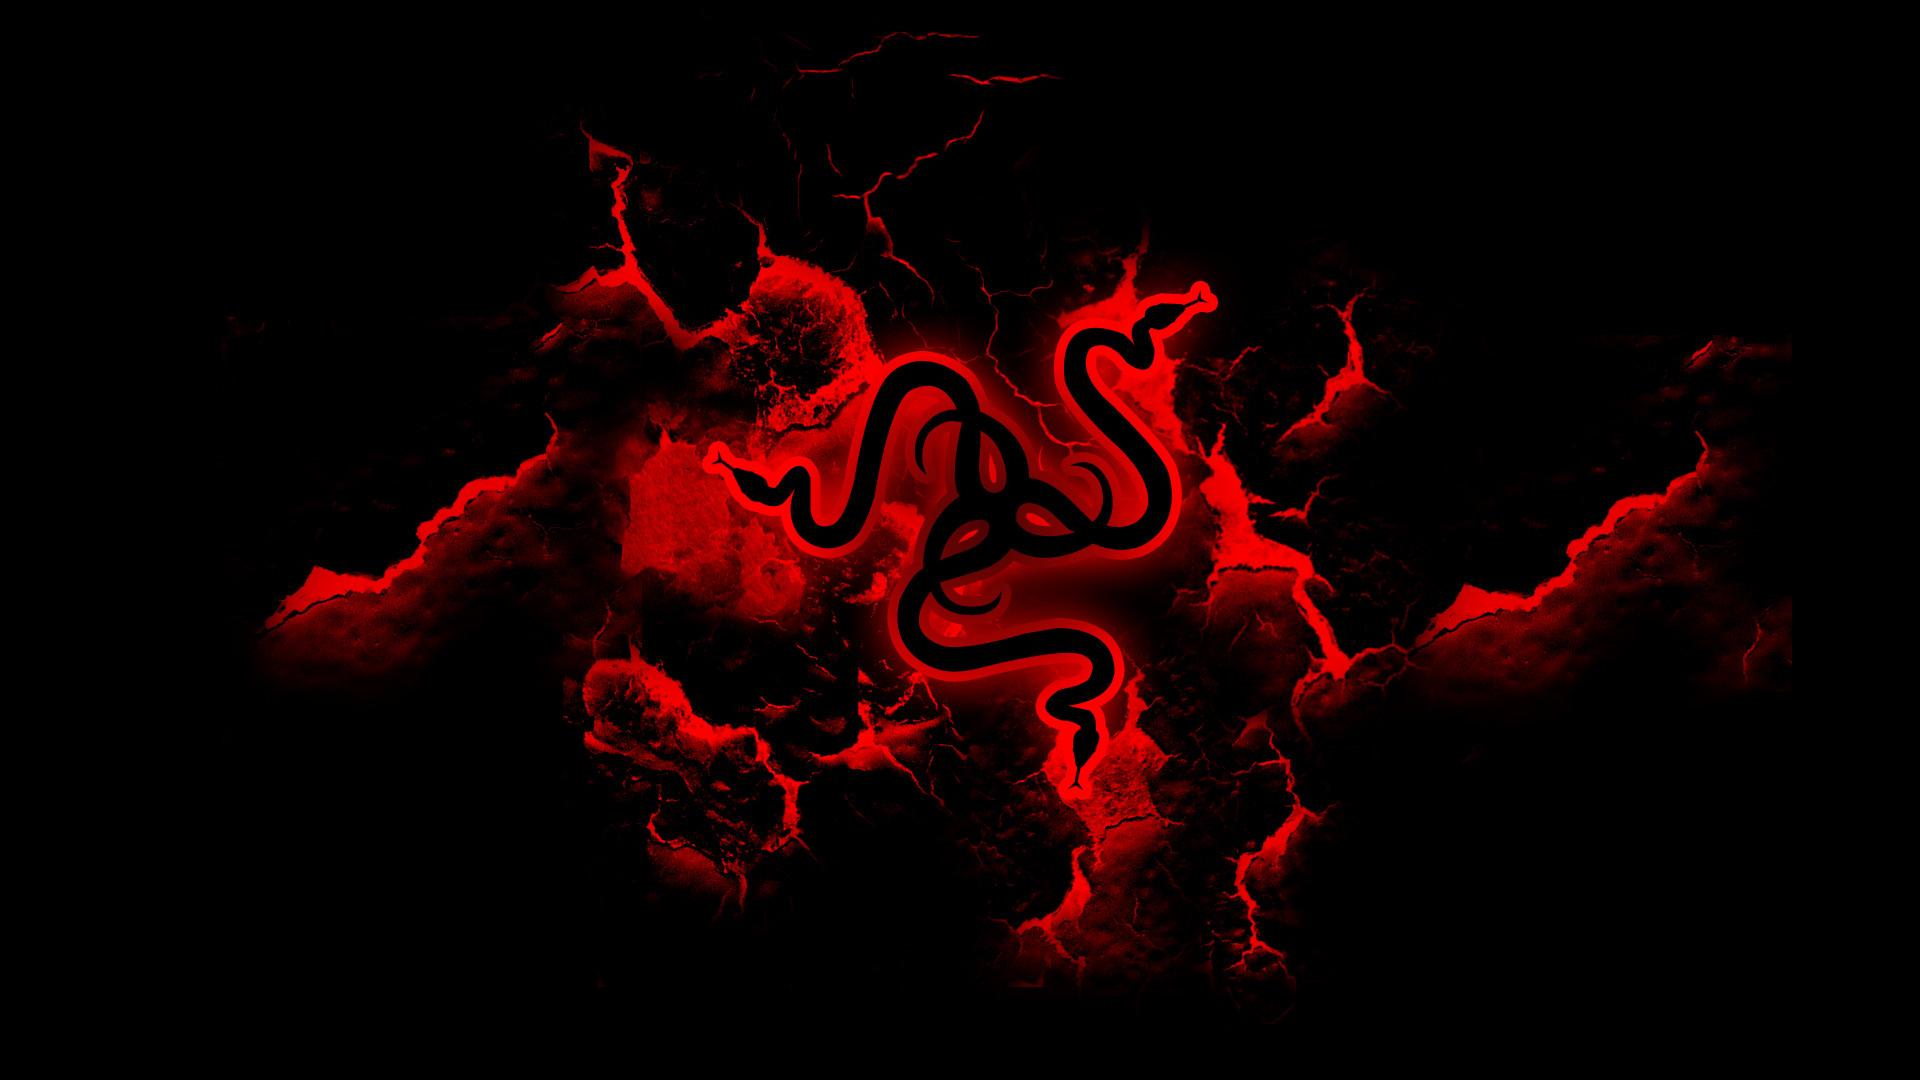 Red Razer Wallpaper Hd 78 Images